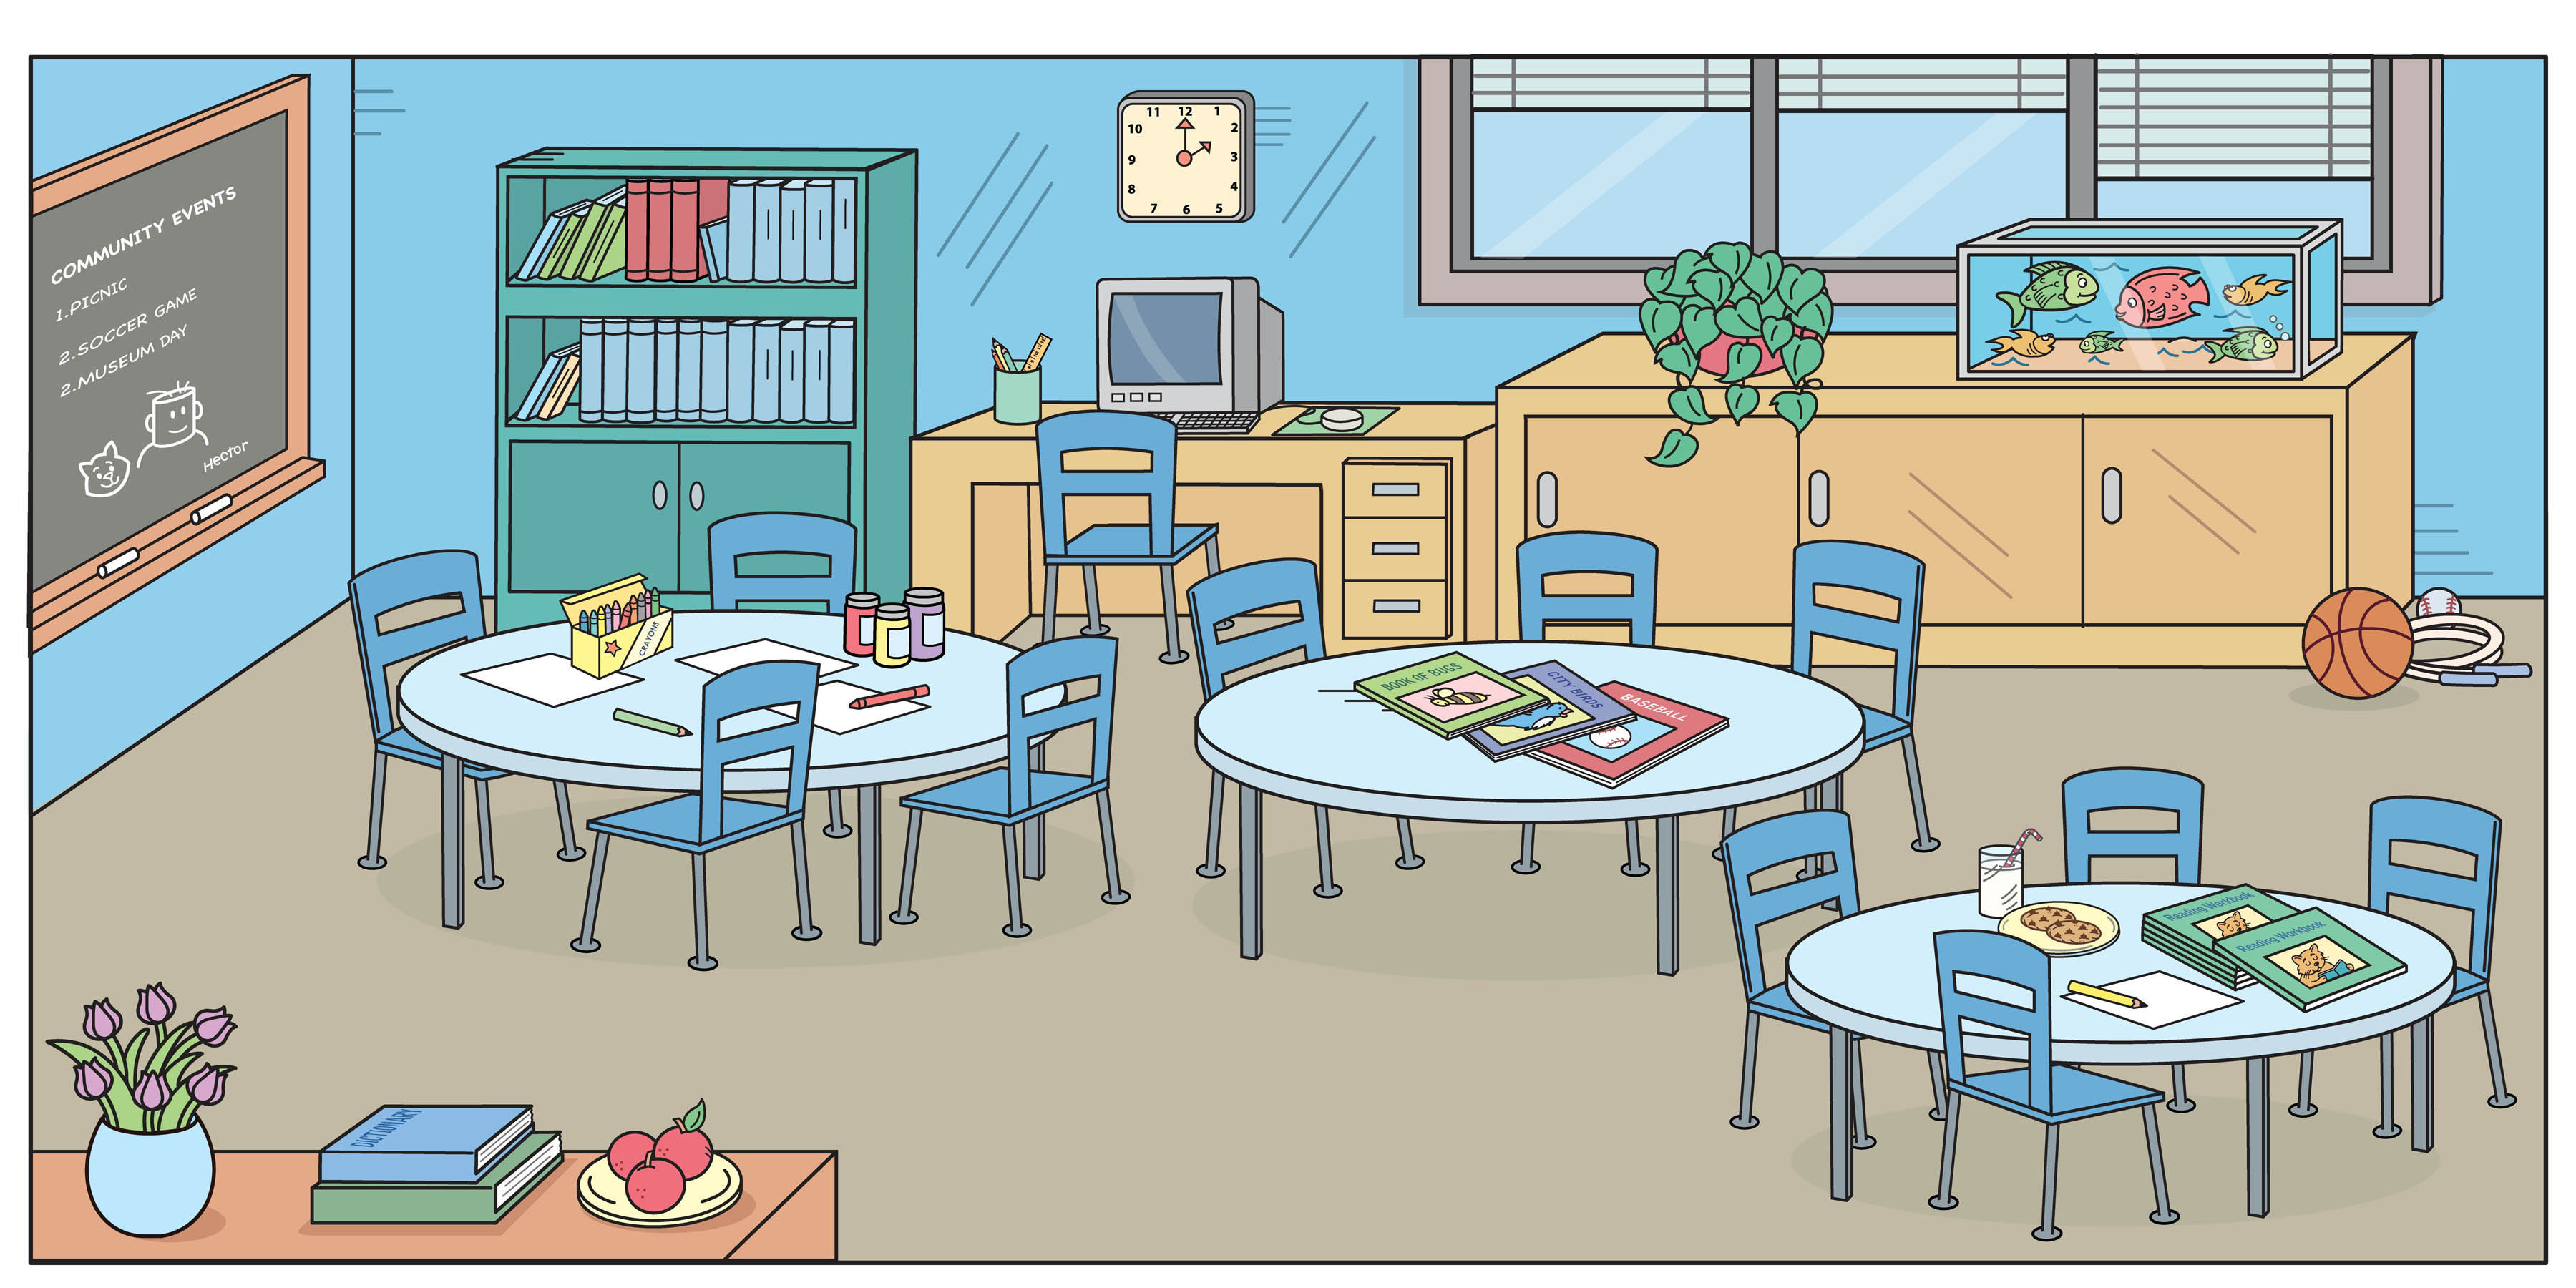 Classroom clipart 2 - Classroomclipart